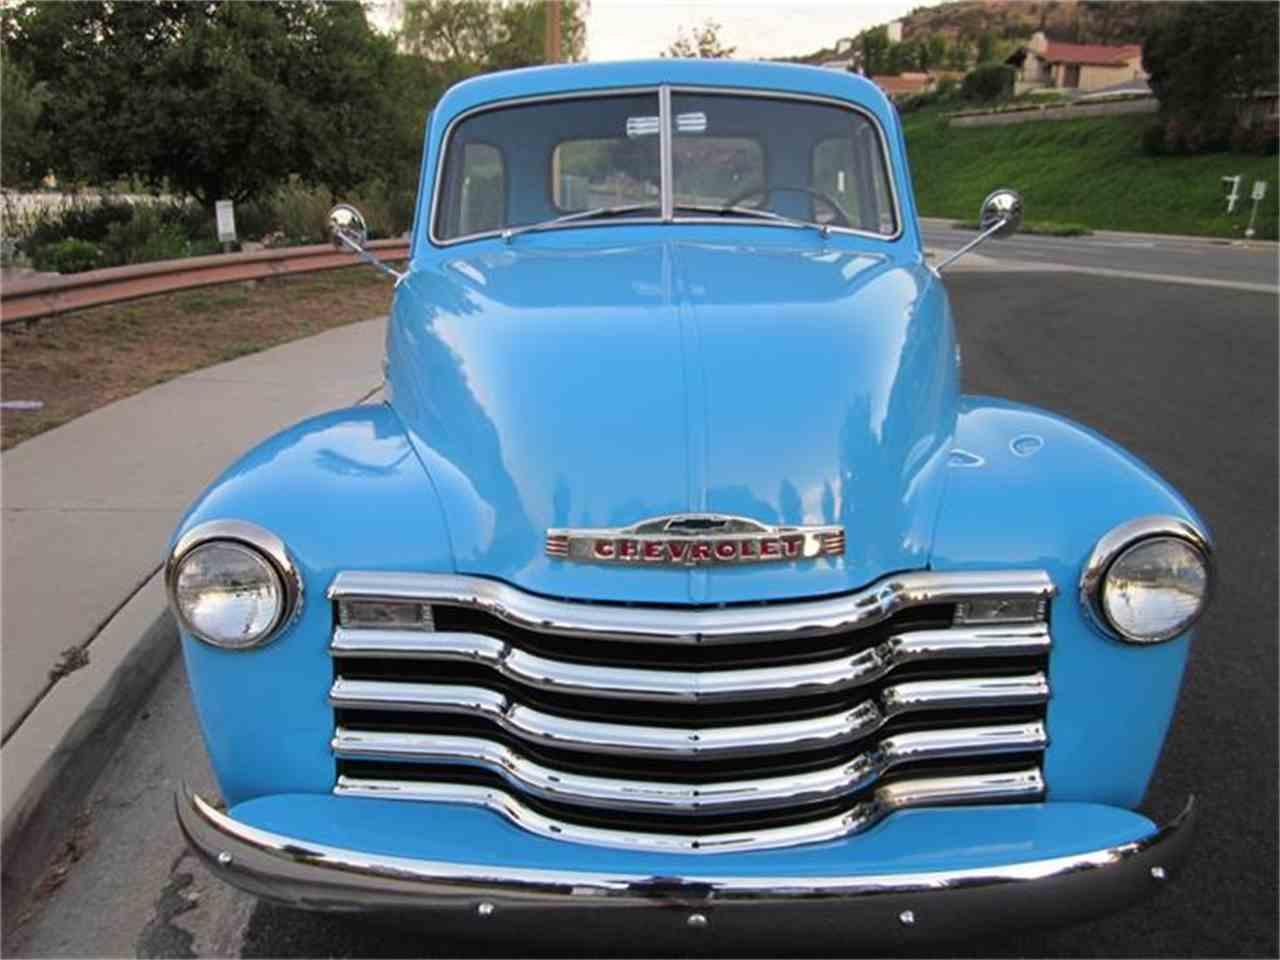 Pickup 1949 chevrolet pickup : 1949 Chevrolet Pickup for Sale   ClassicCars.com   CC-874866